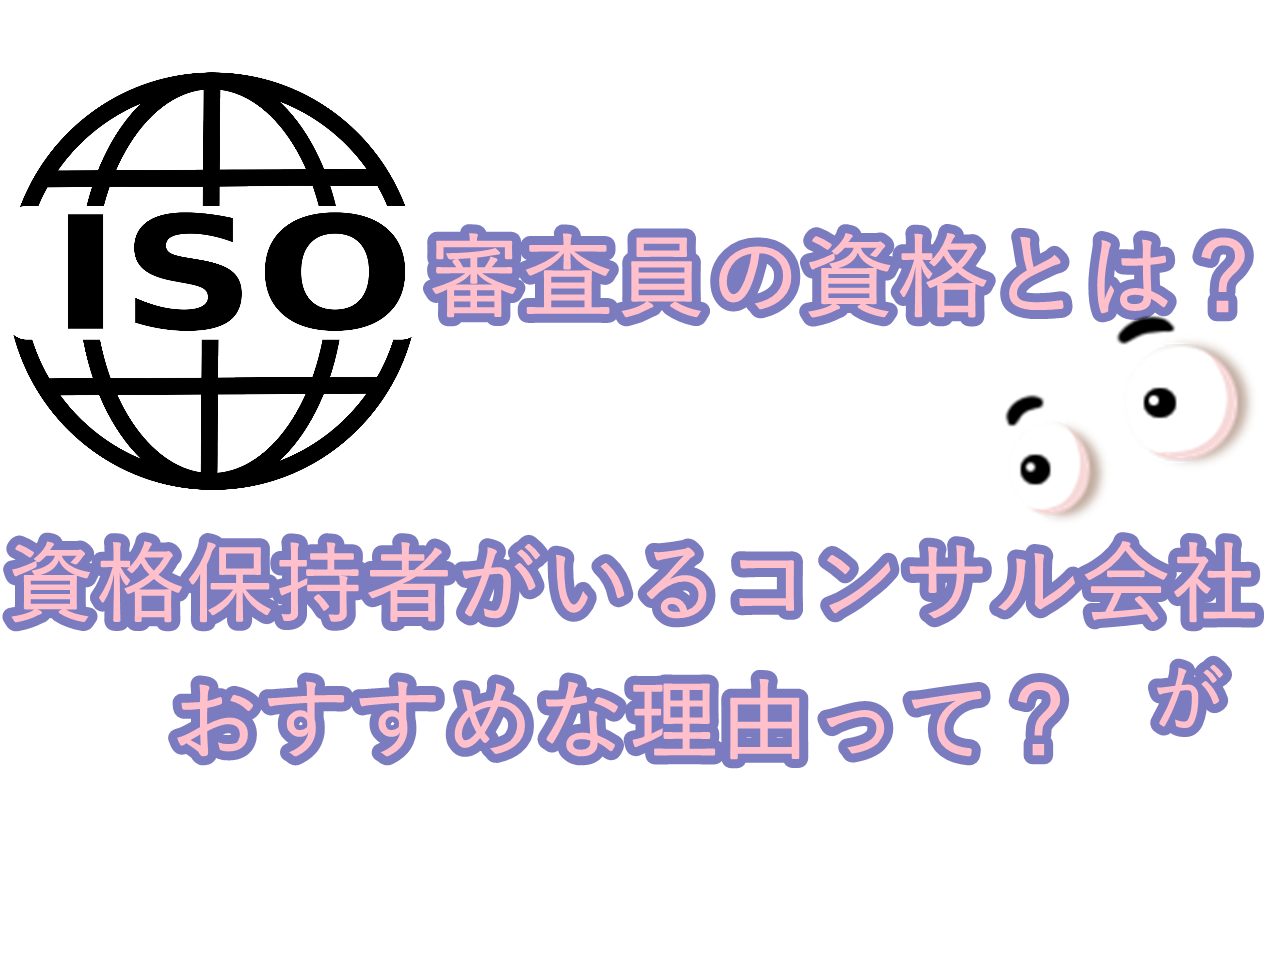 ISO審査員の資格とは?資格保持者がいるコンサル会社はおすすめ?